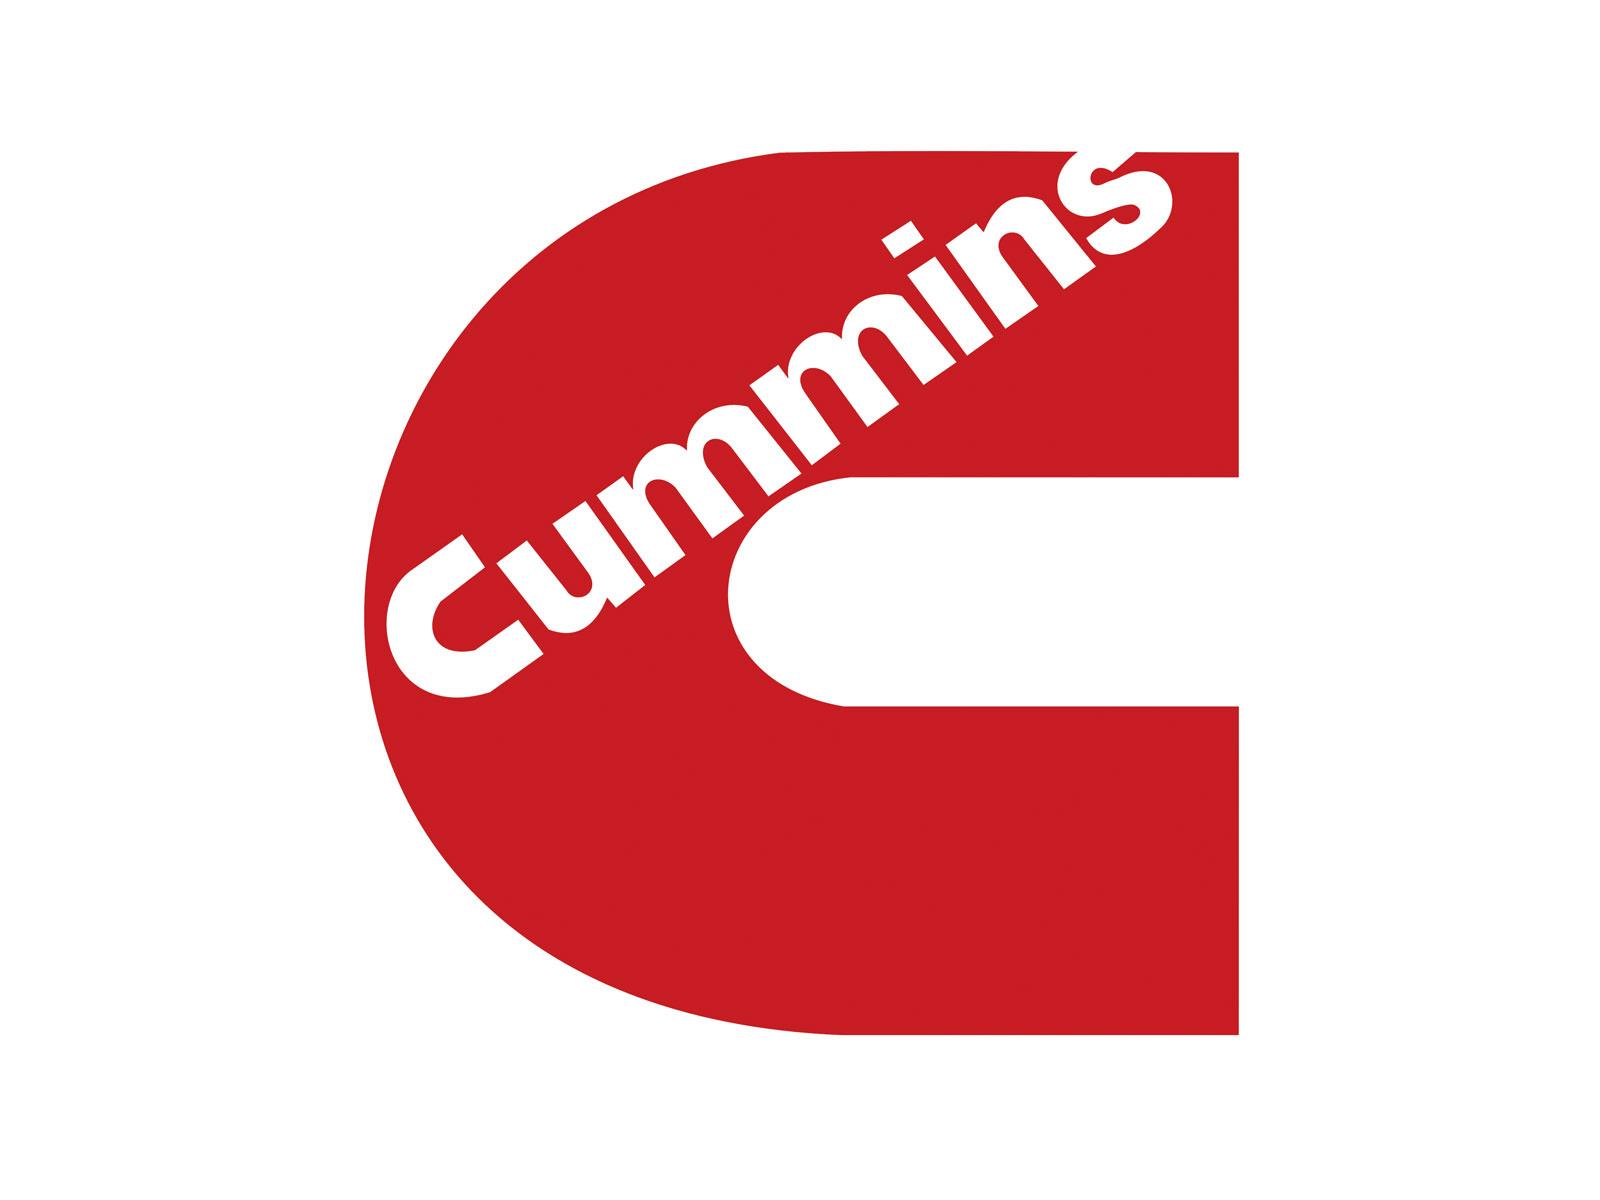 Employee Relations Specialist Recruitment at Cummins Inc